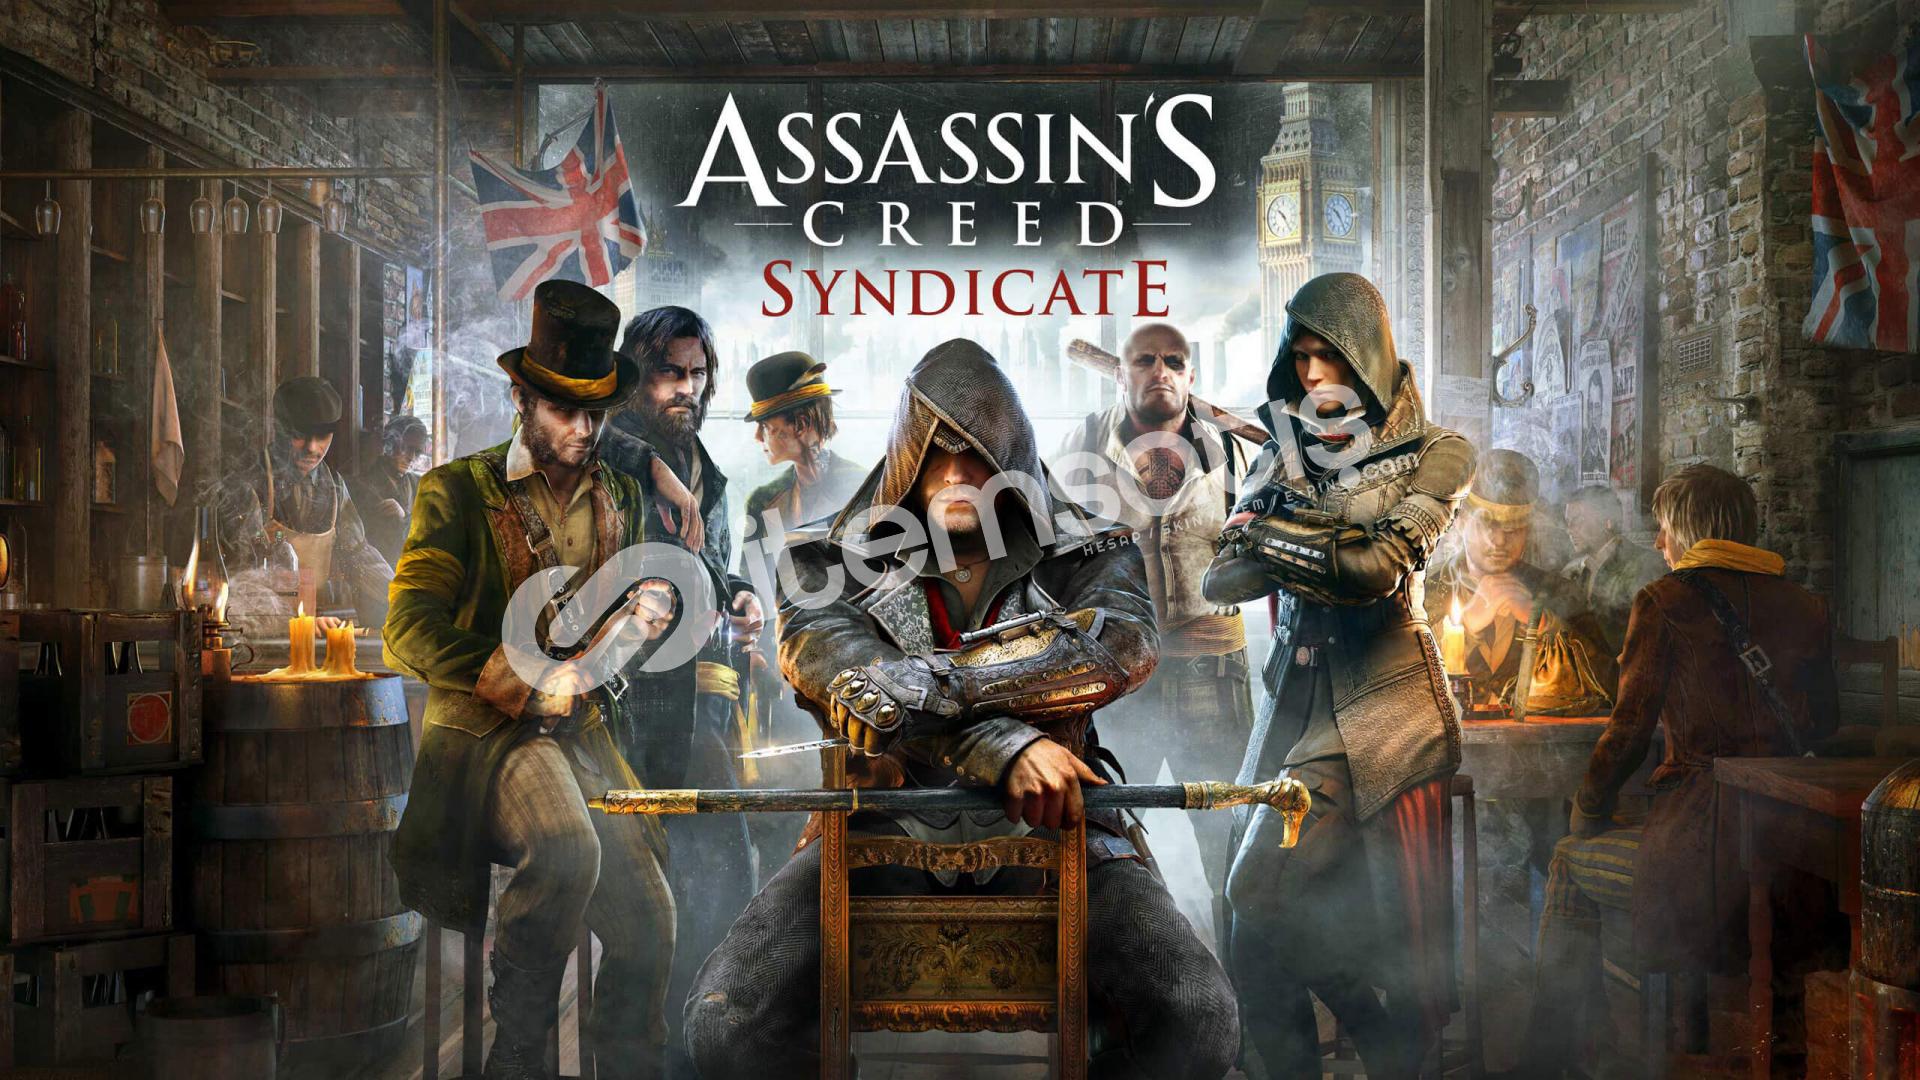 Assassin's Creed Sydincate 3TL